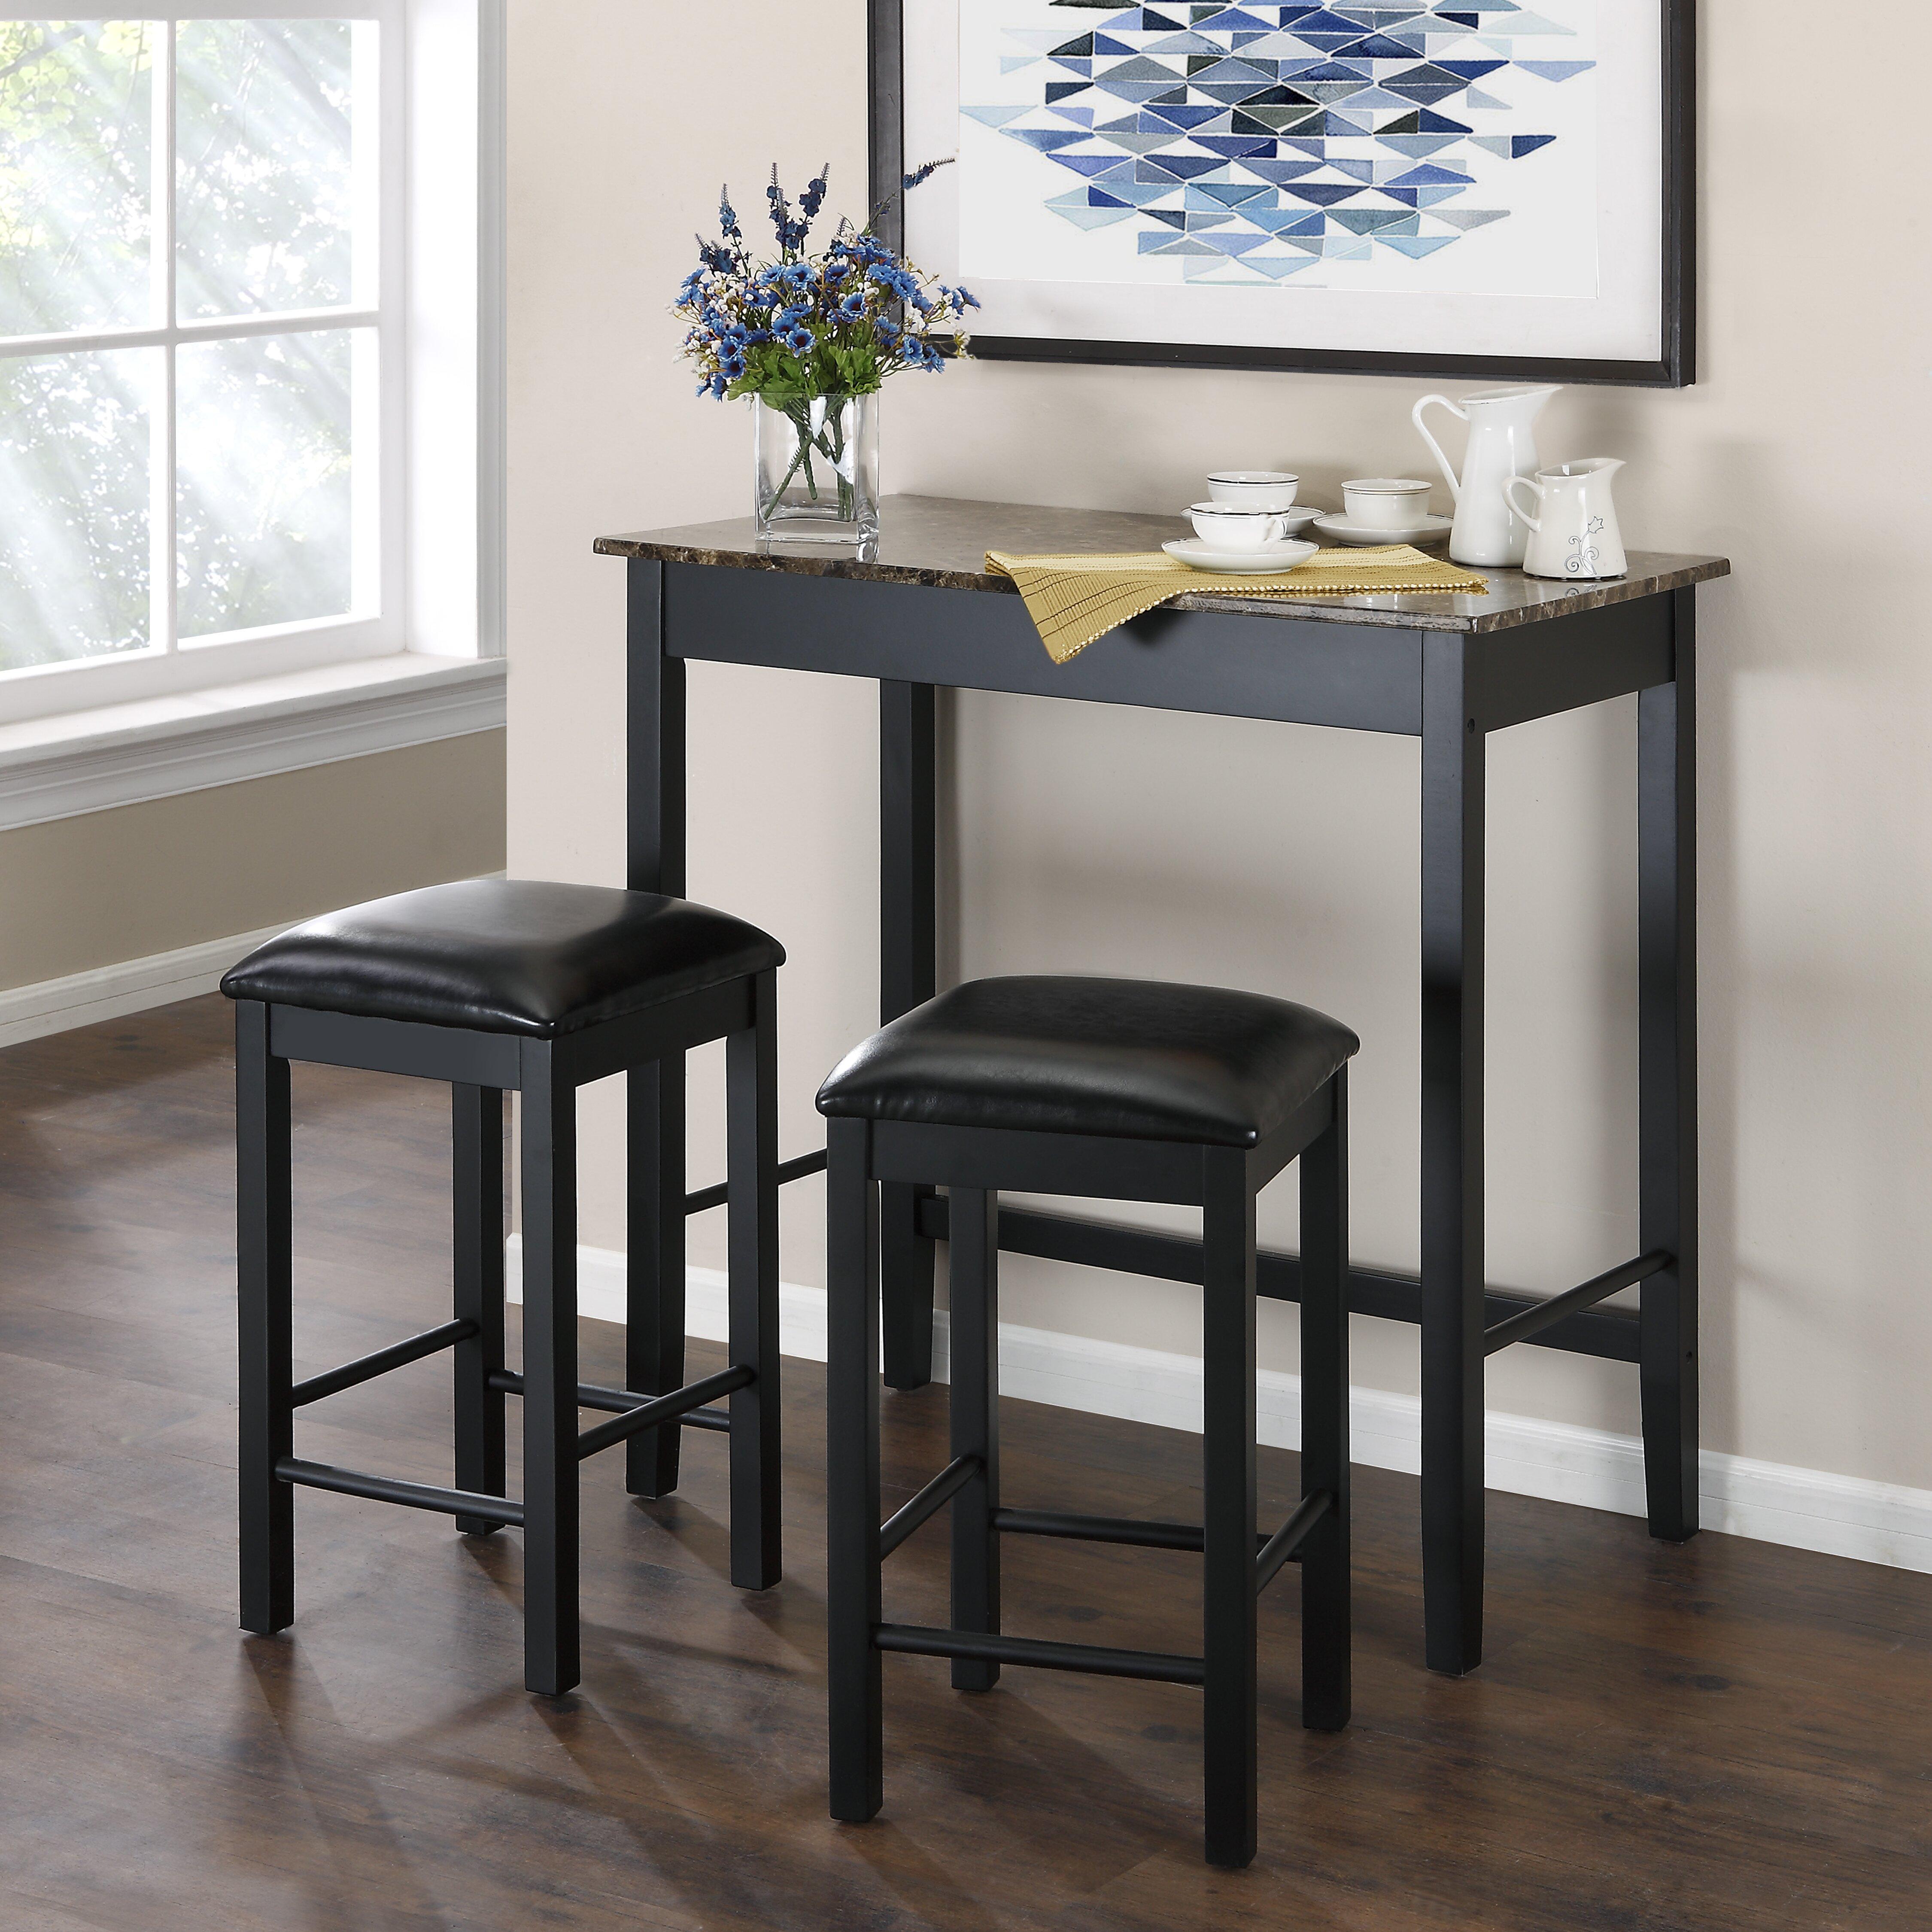 3 Piece Dining Room Set: Dorel Living Devyn 3 Piece Dining Set & Reviews